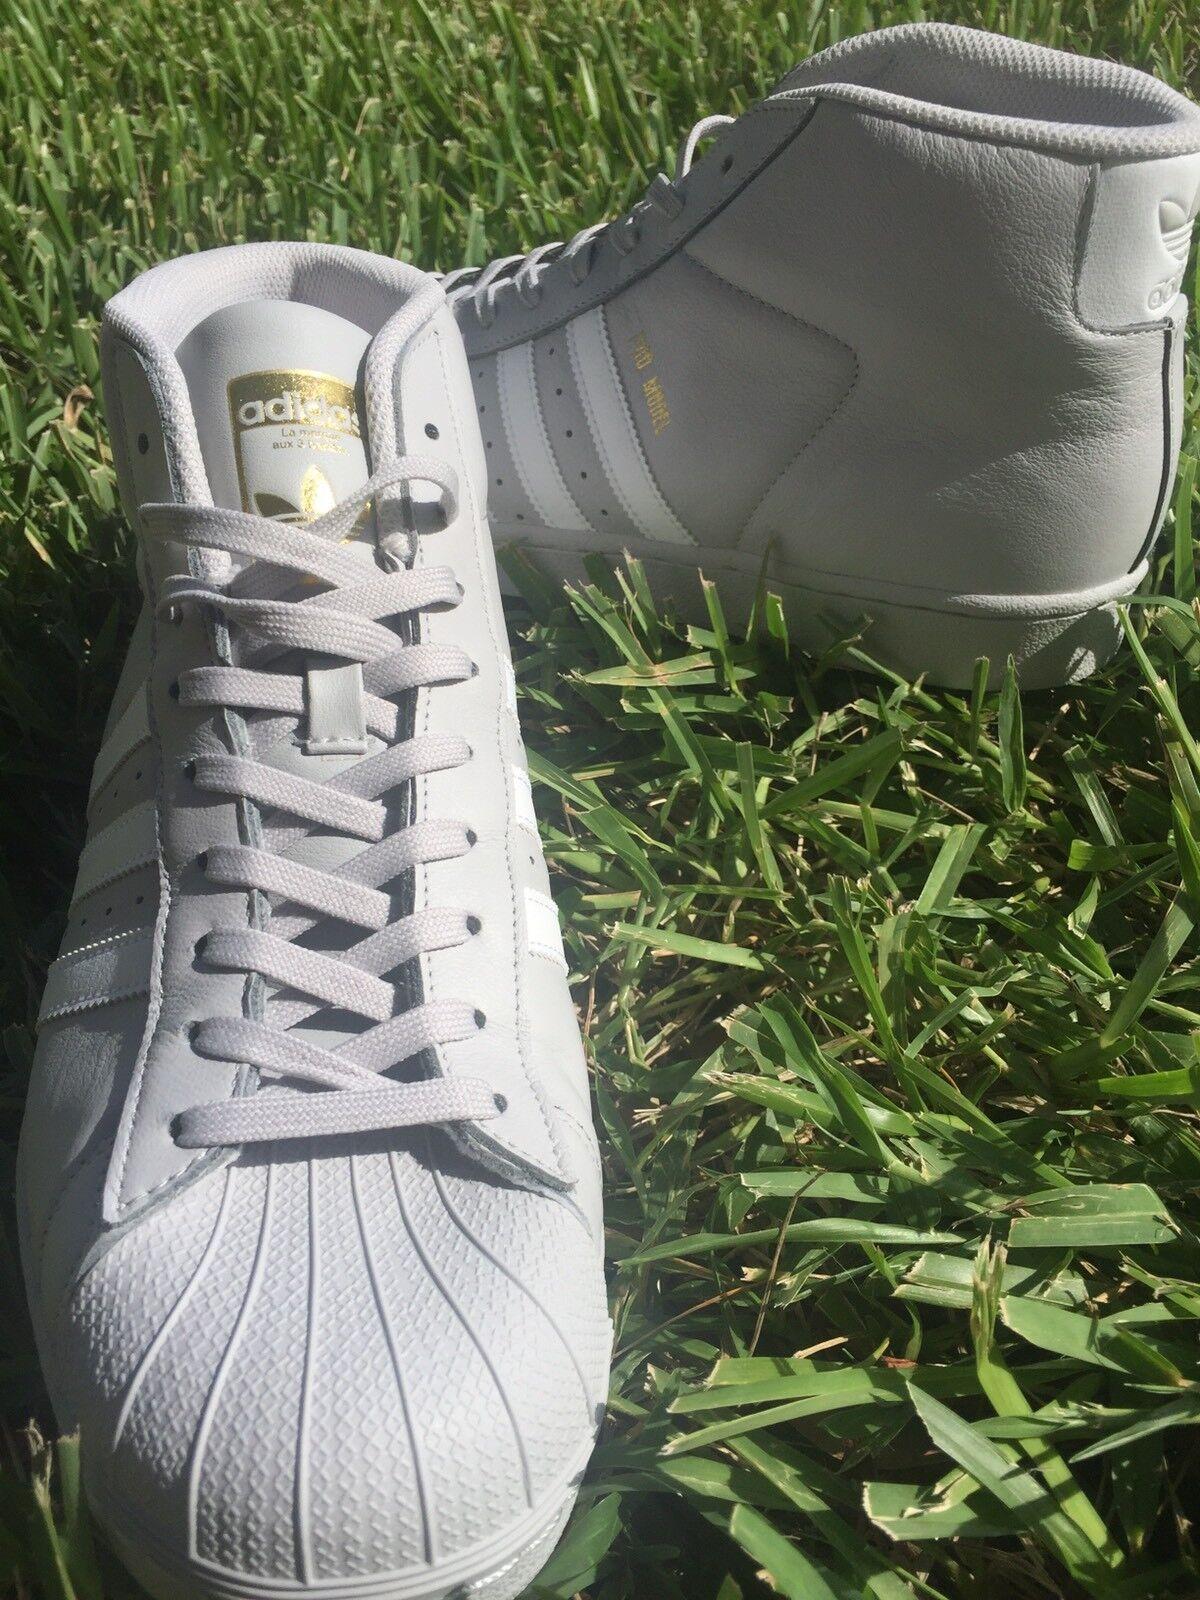 Hombre Adidas Pro Model Gris comodo baratos zapatos de mujer de zapatos de mujer mujer f0e9f1